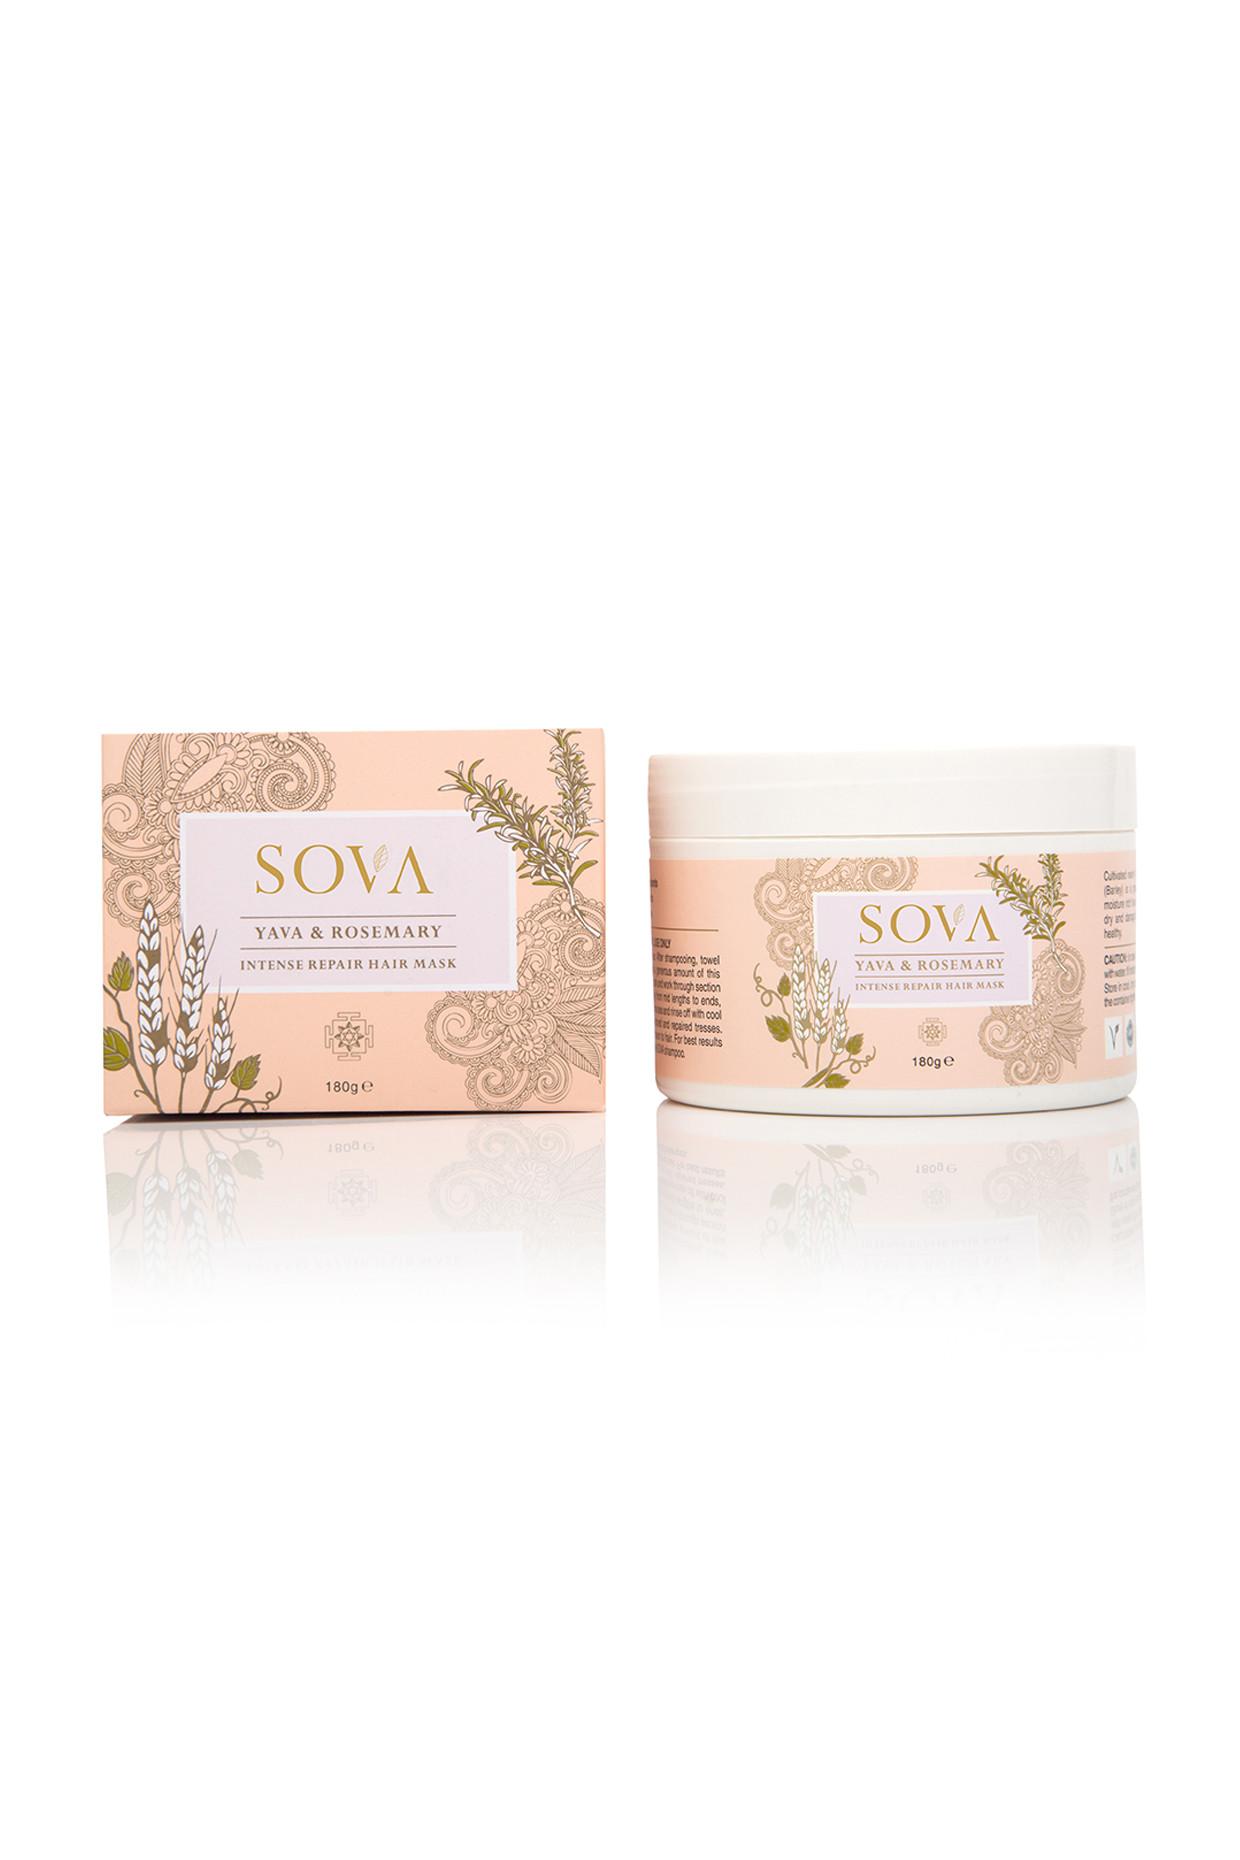 Rosemary & Yava Intense Repair Hair Mask For All Hair Types by SOVA